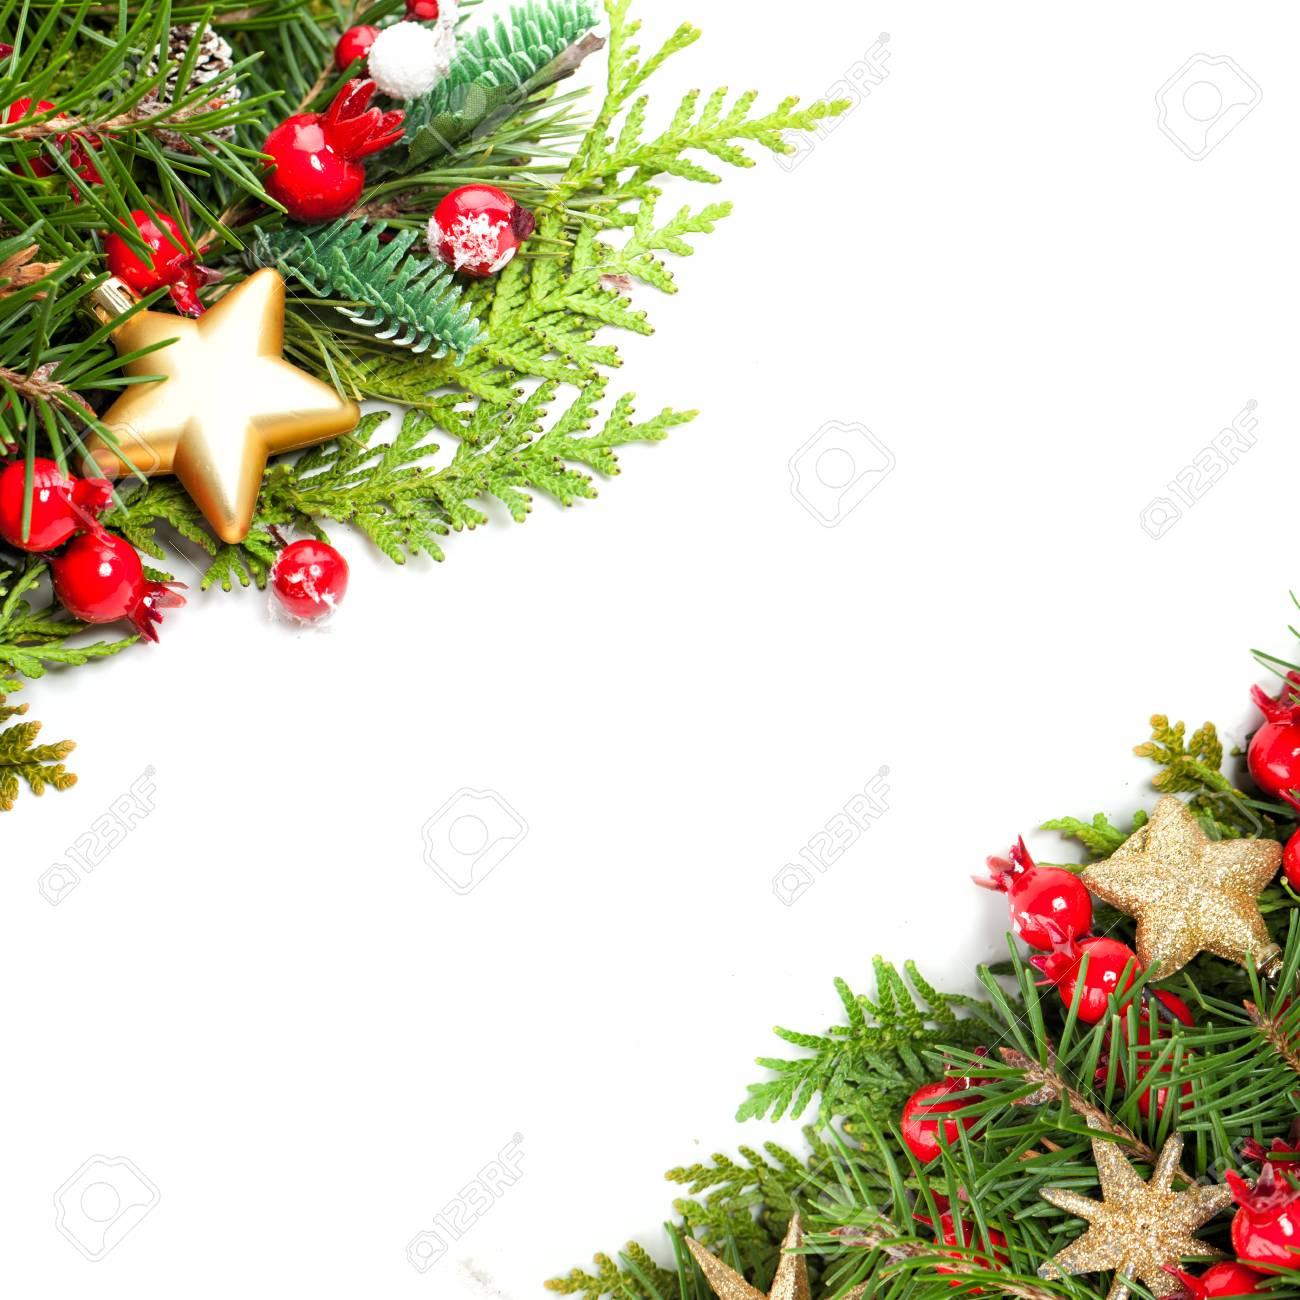 Beautiful Christmas Background Design.Beautiful Christmas Background With Xmas Tree Twig Red Holly